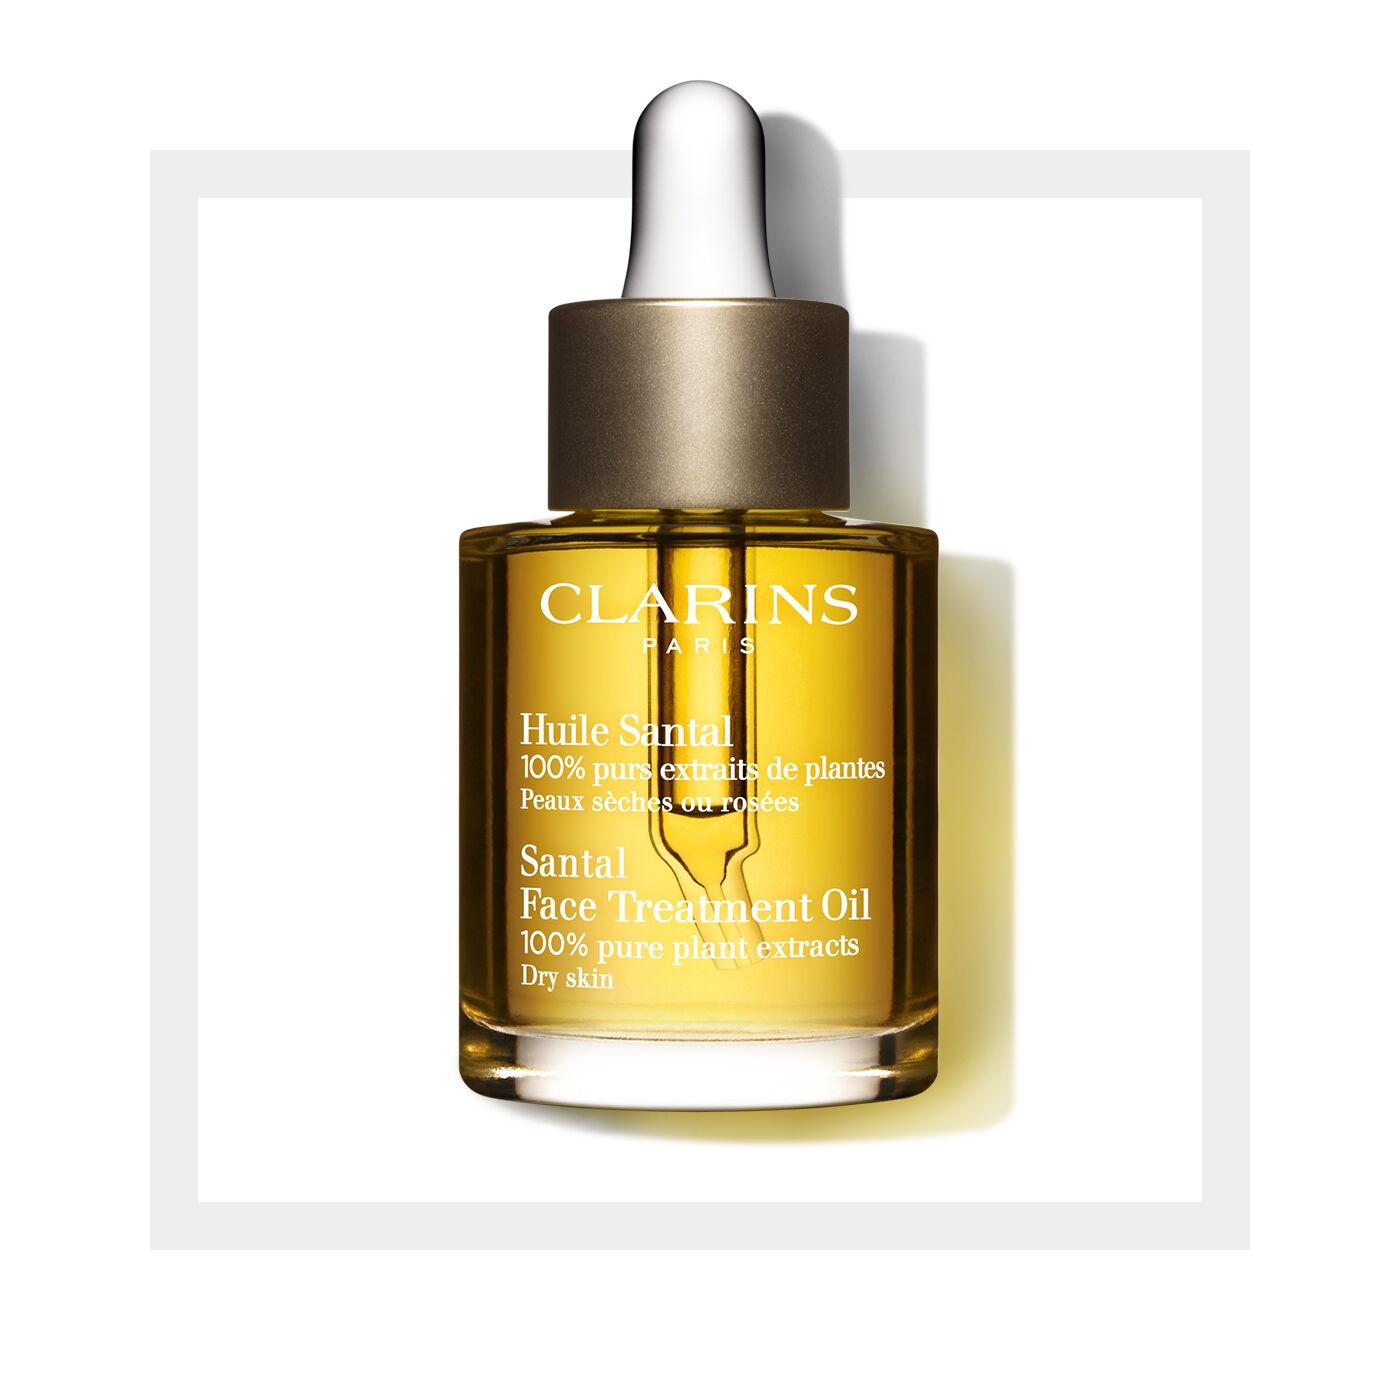 Santal Face Treatment Oil - ผิวแห้ง/รอยแดง